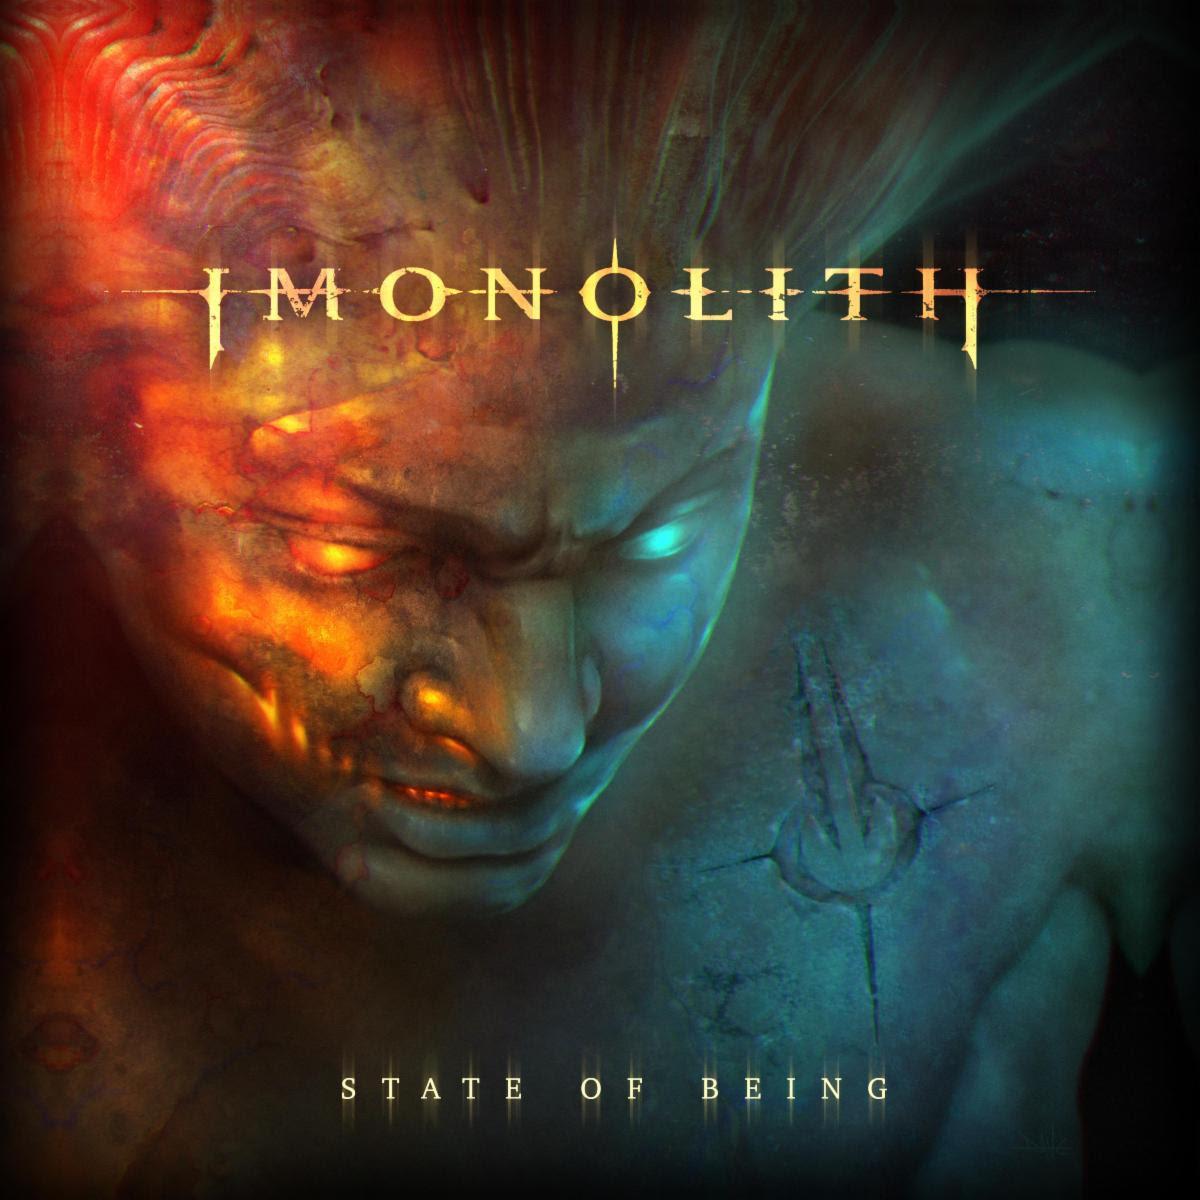 New album announced: Imonolith : State Of Being  https:// hasitleaked.com/2020/imonolith -state-of-being/?utm_source=dlvr.it&utm_medium=twitter  …  #AlternativeMetal #Experimental<br>http://pic.twitter.com/9UzT16Wnsj